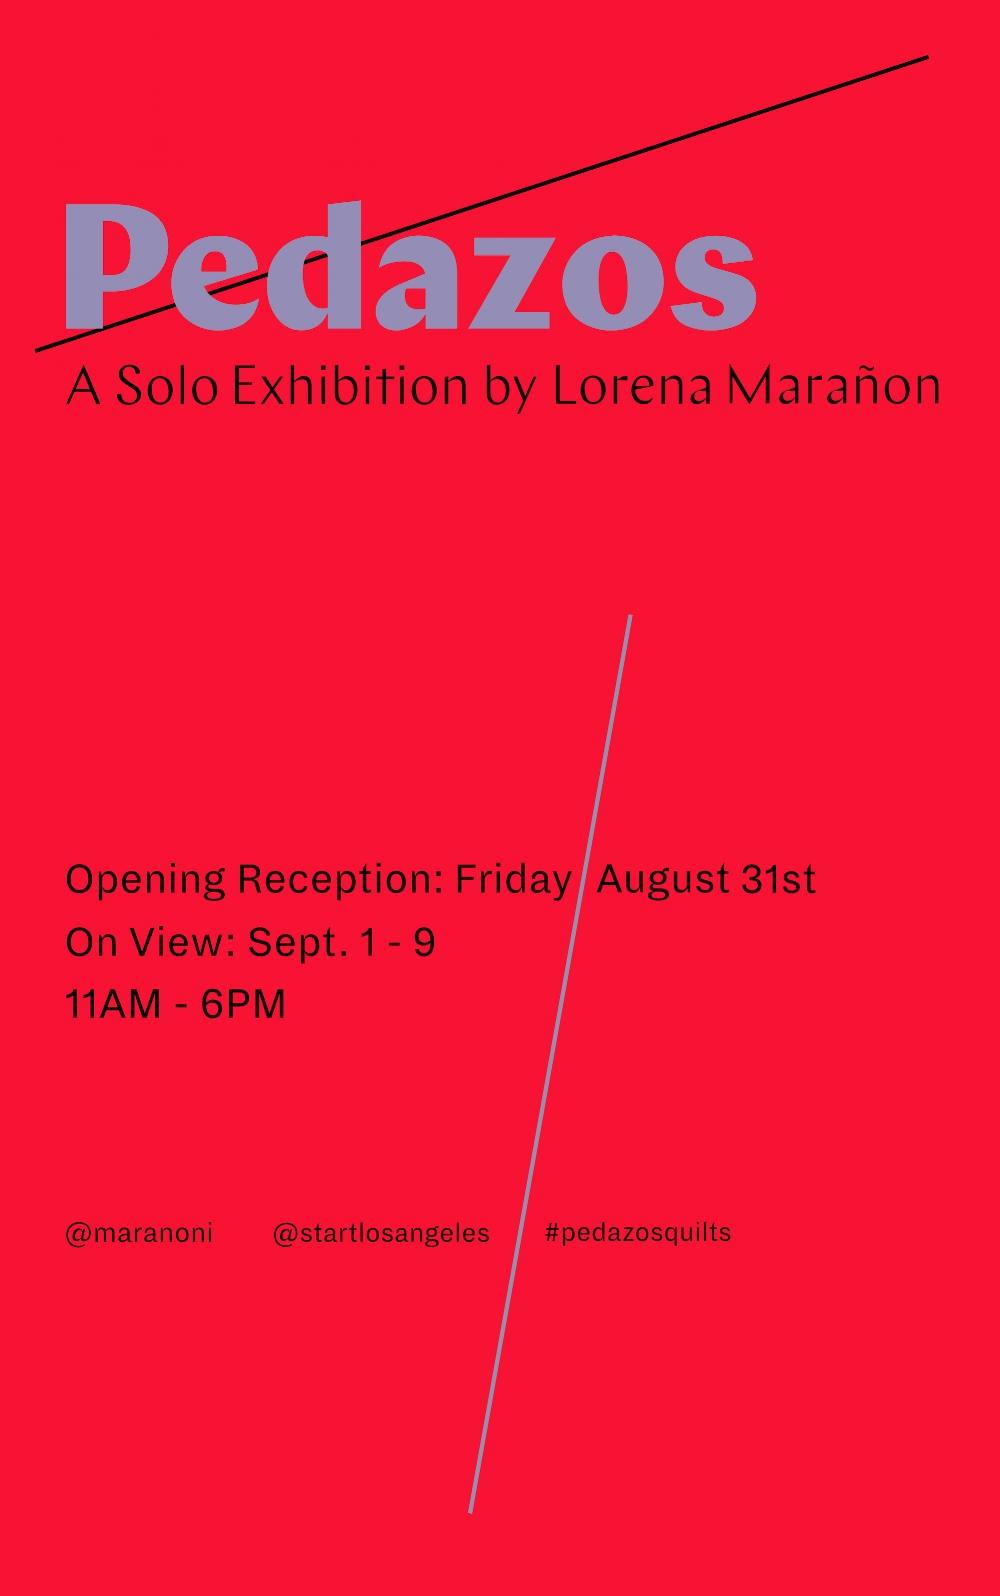 pedazos_exhibition_lorena_maranon.jpg